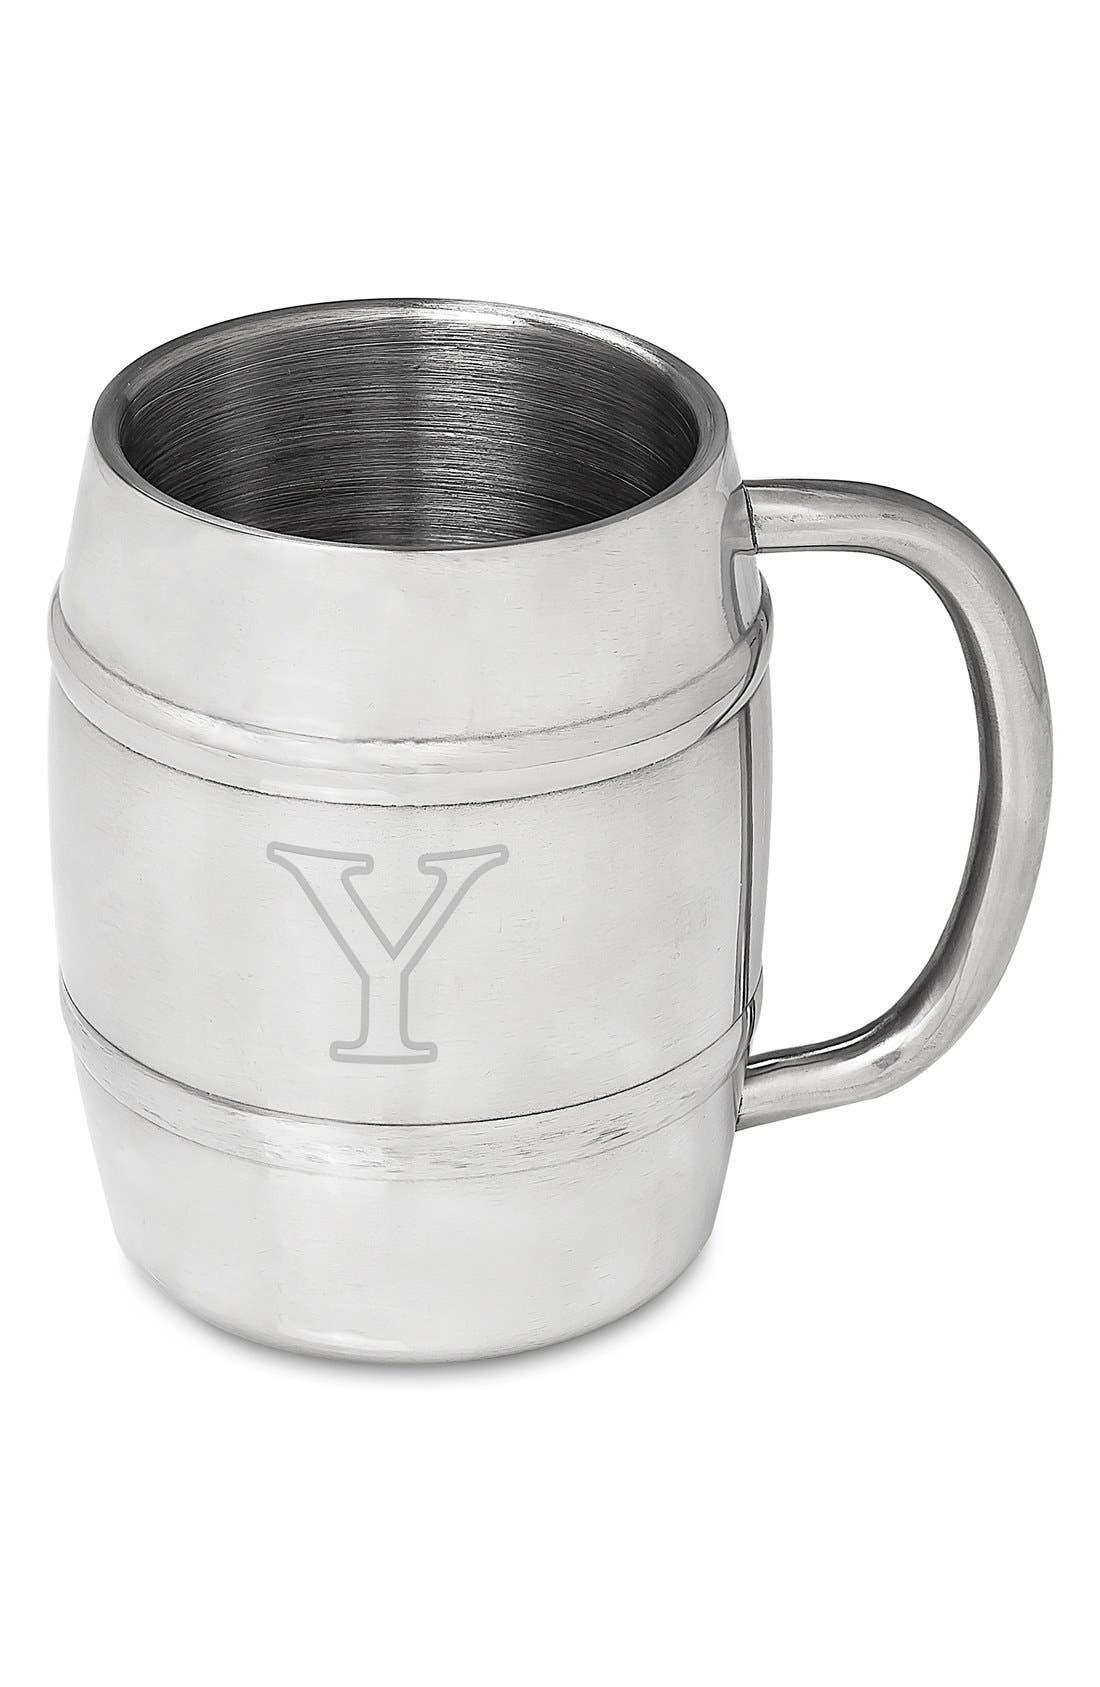 Monogram Stainless Steel Keg Mug,                             Main thumbnail 26, color,